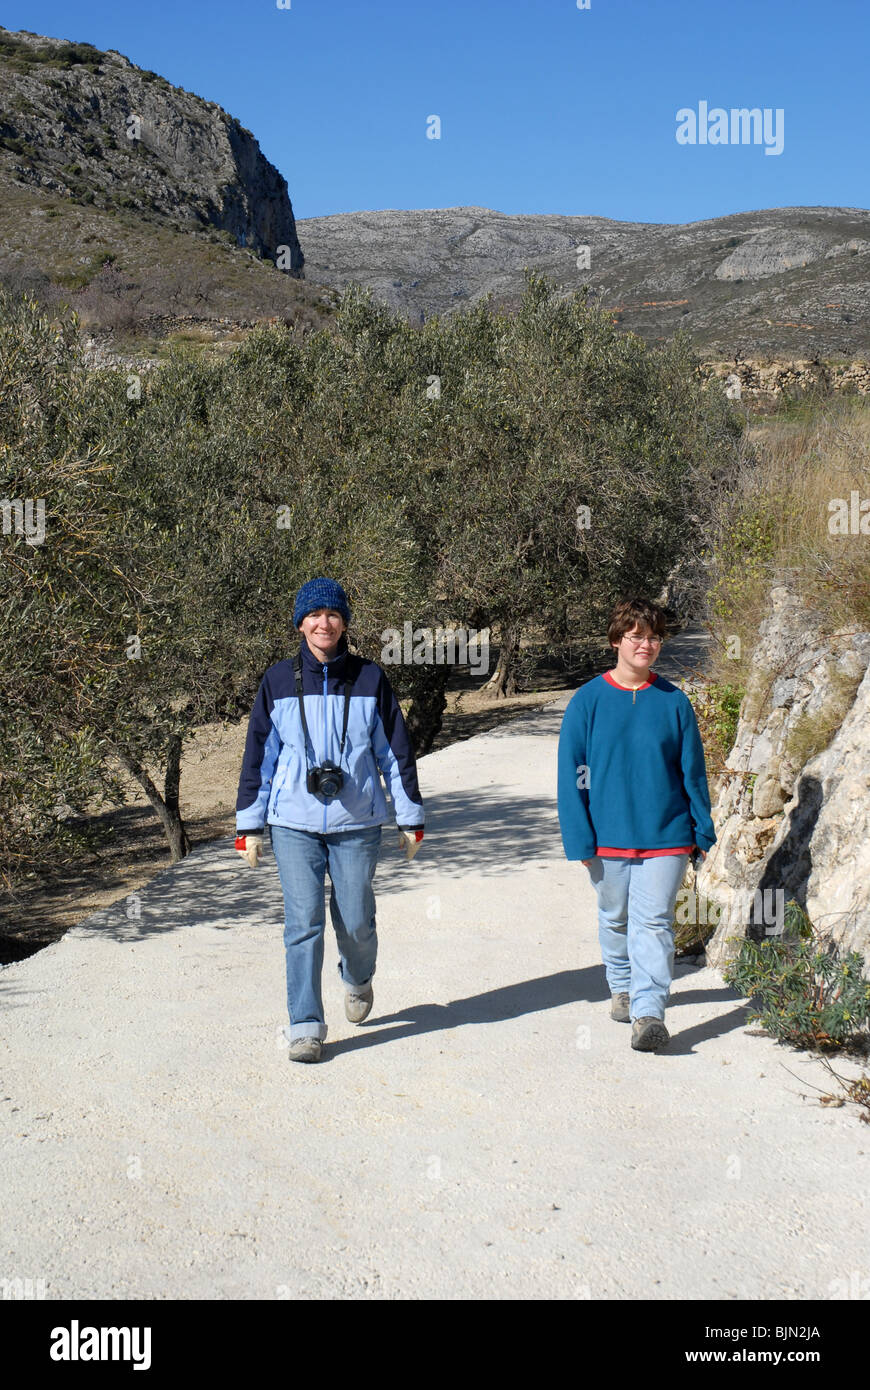 hikers walking on mountain track near Tarbena, Alicante Province, Comunidad Valenciana, Spain - Stock Image